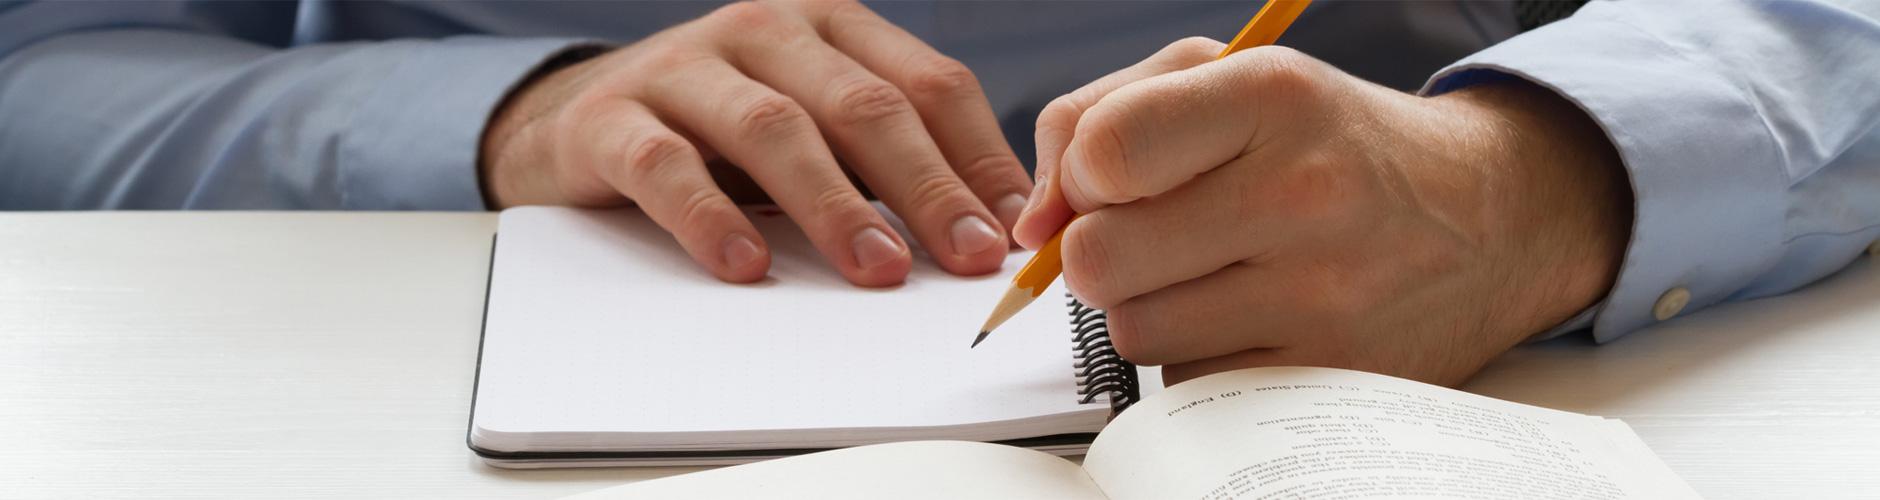 Civil Services Preliminary Examination Syllabus